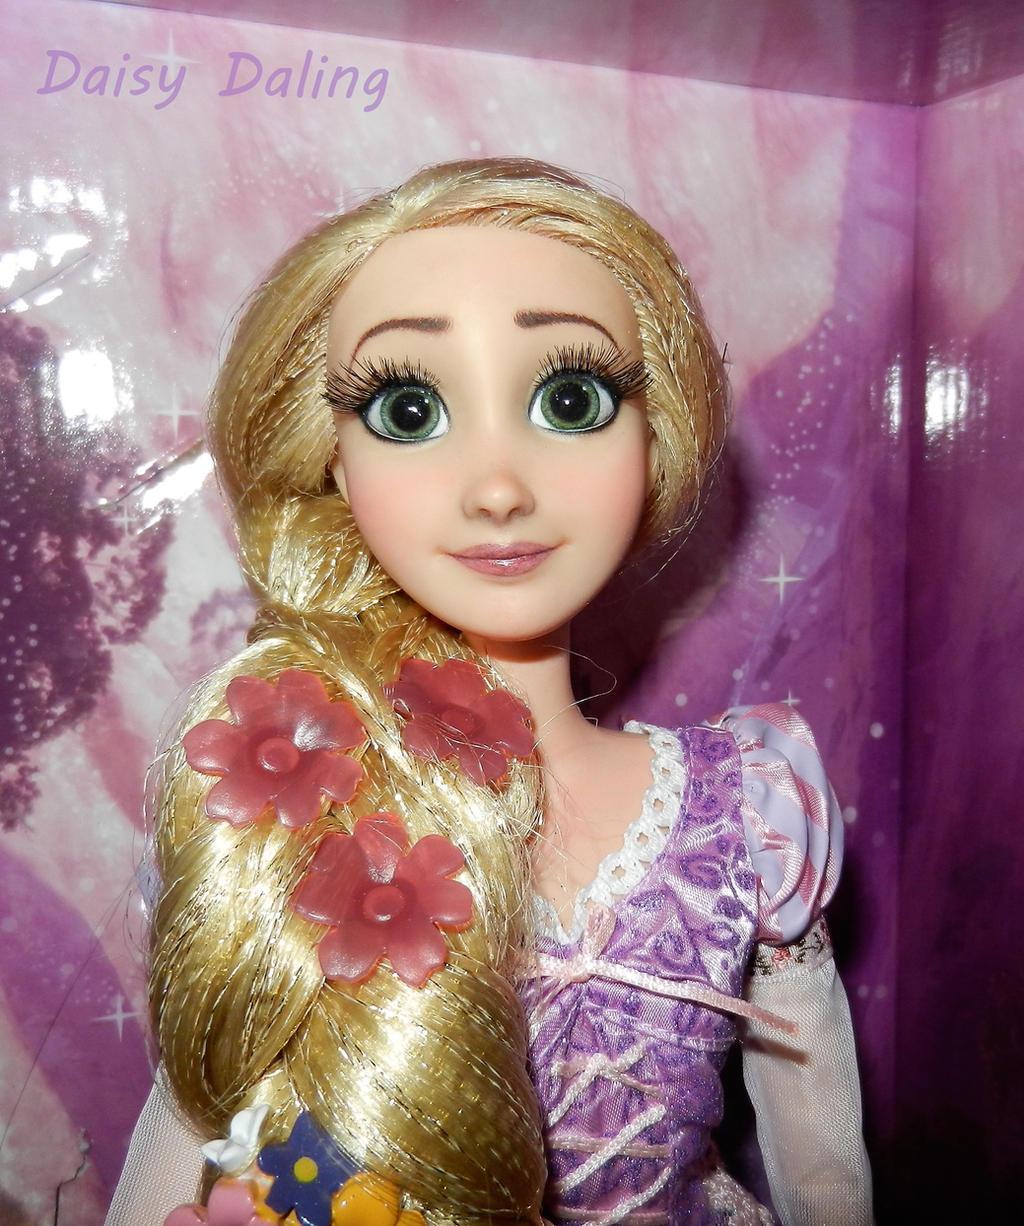 Disney S Tangled Rapunzel Ooak Doll Repaint By Daisydaling